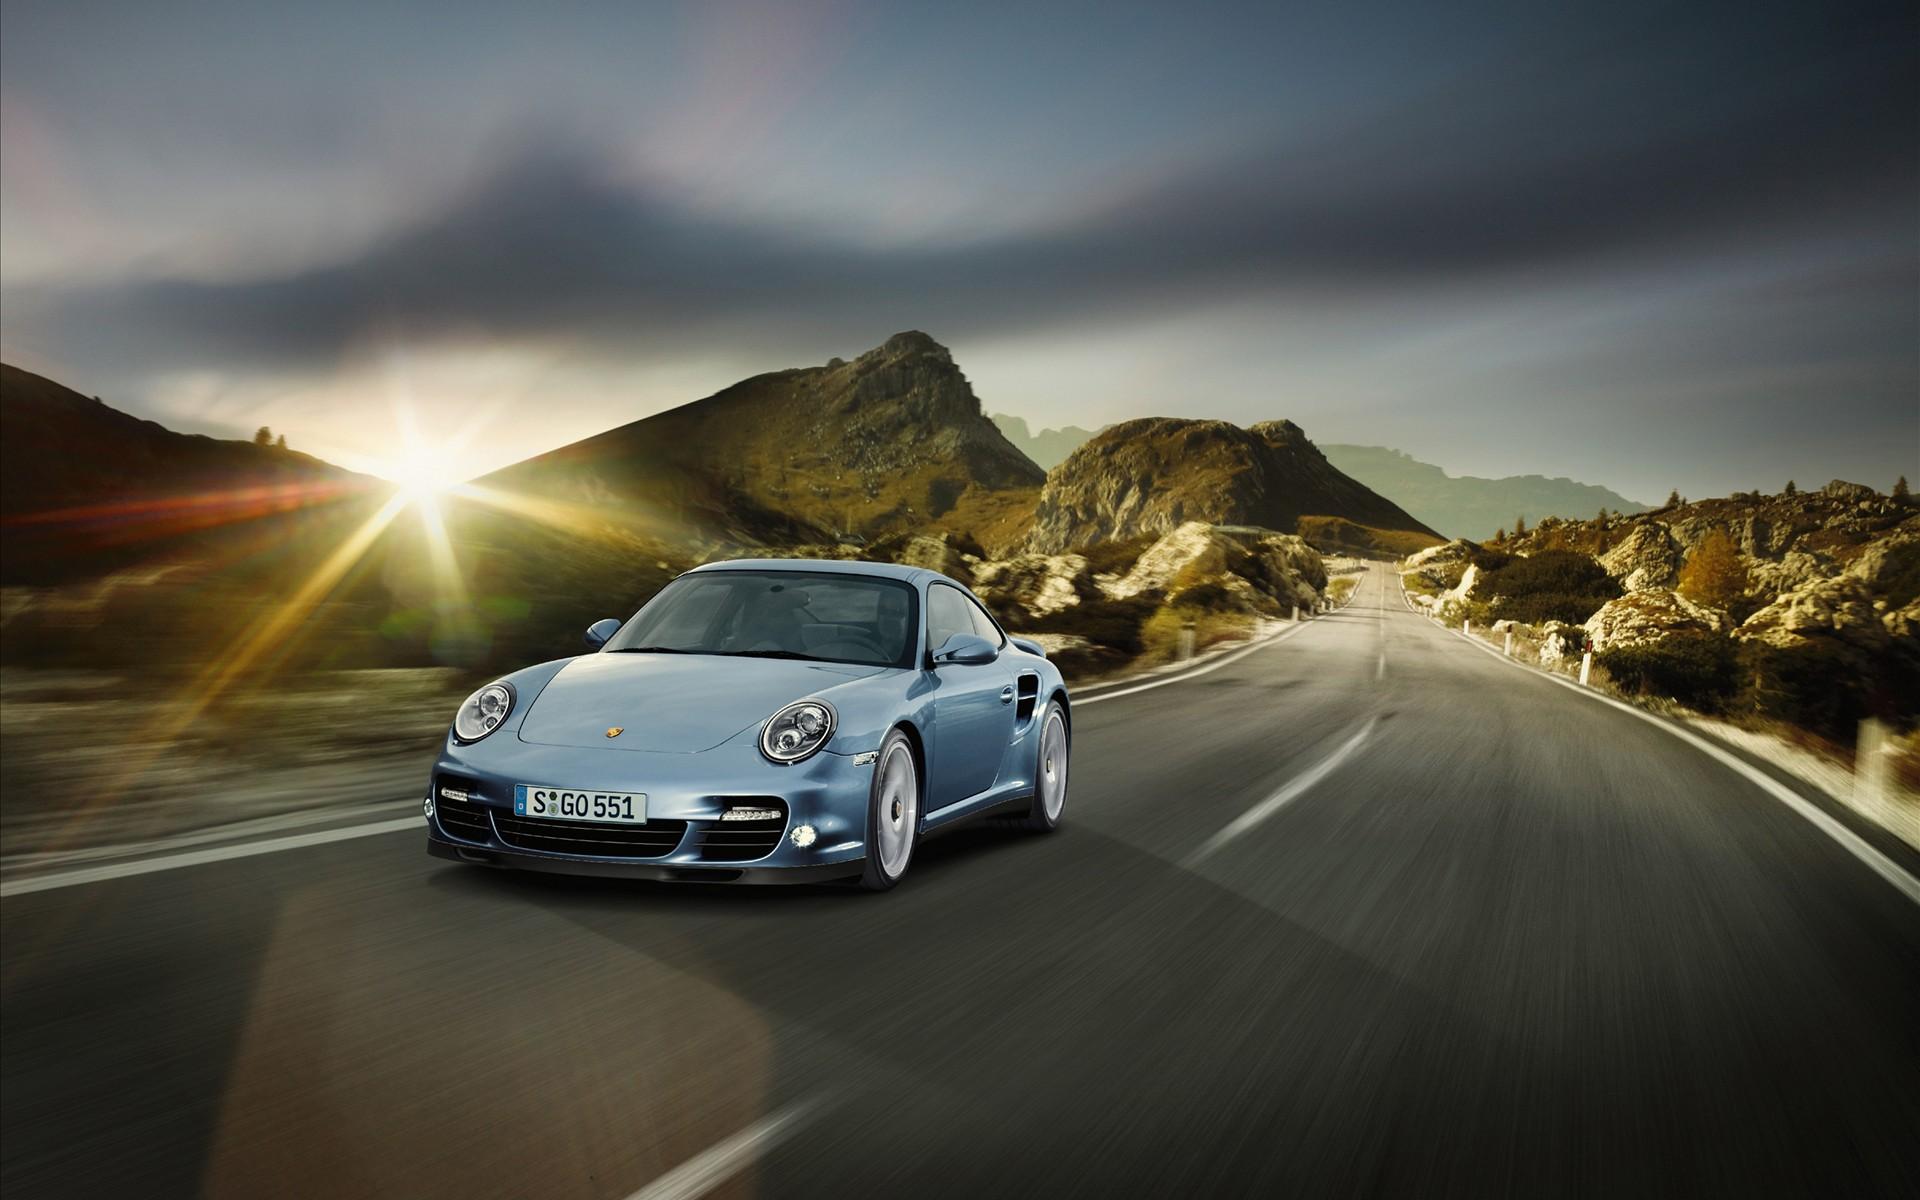 2011 Porsche 911 Turbo S Wallpapers HD Wallpapers 1920x1200